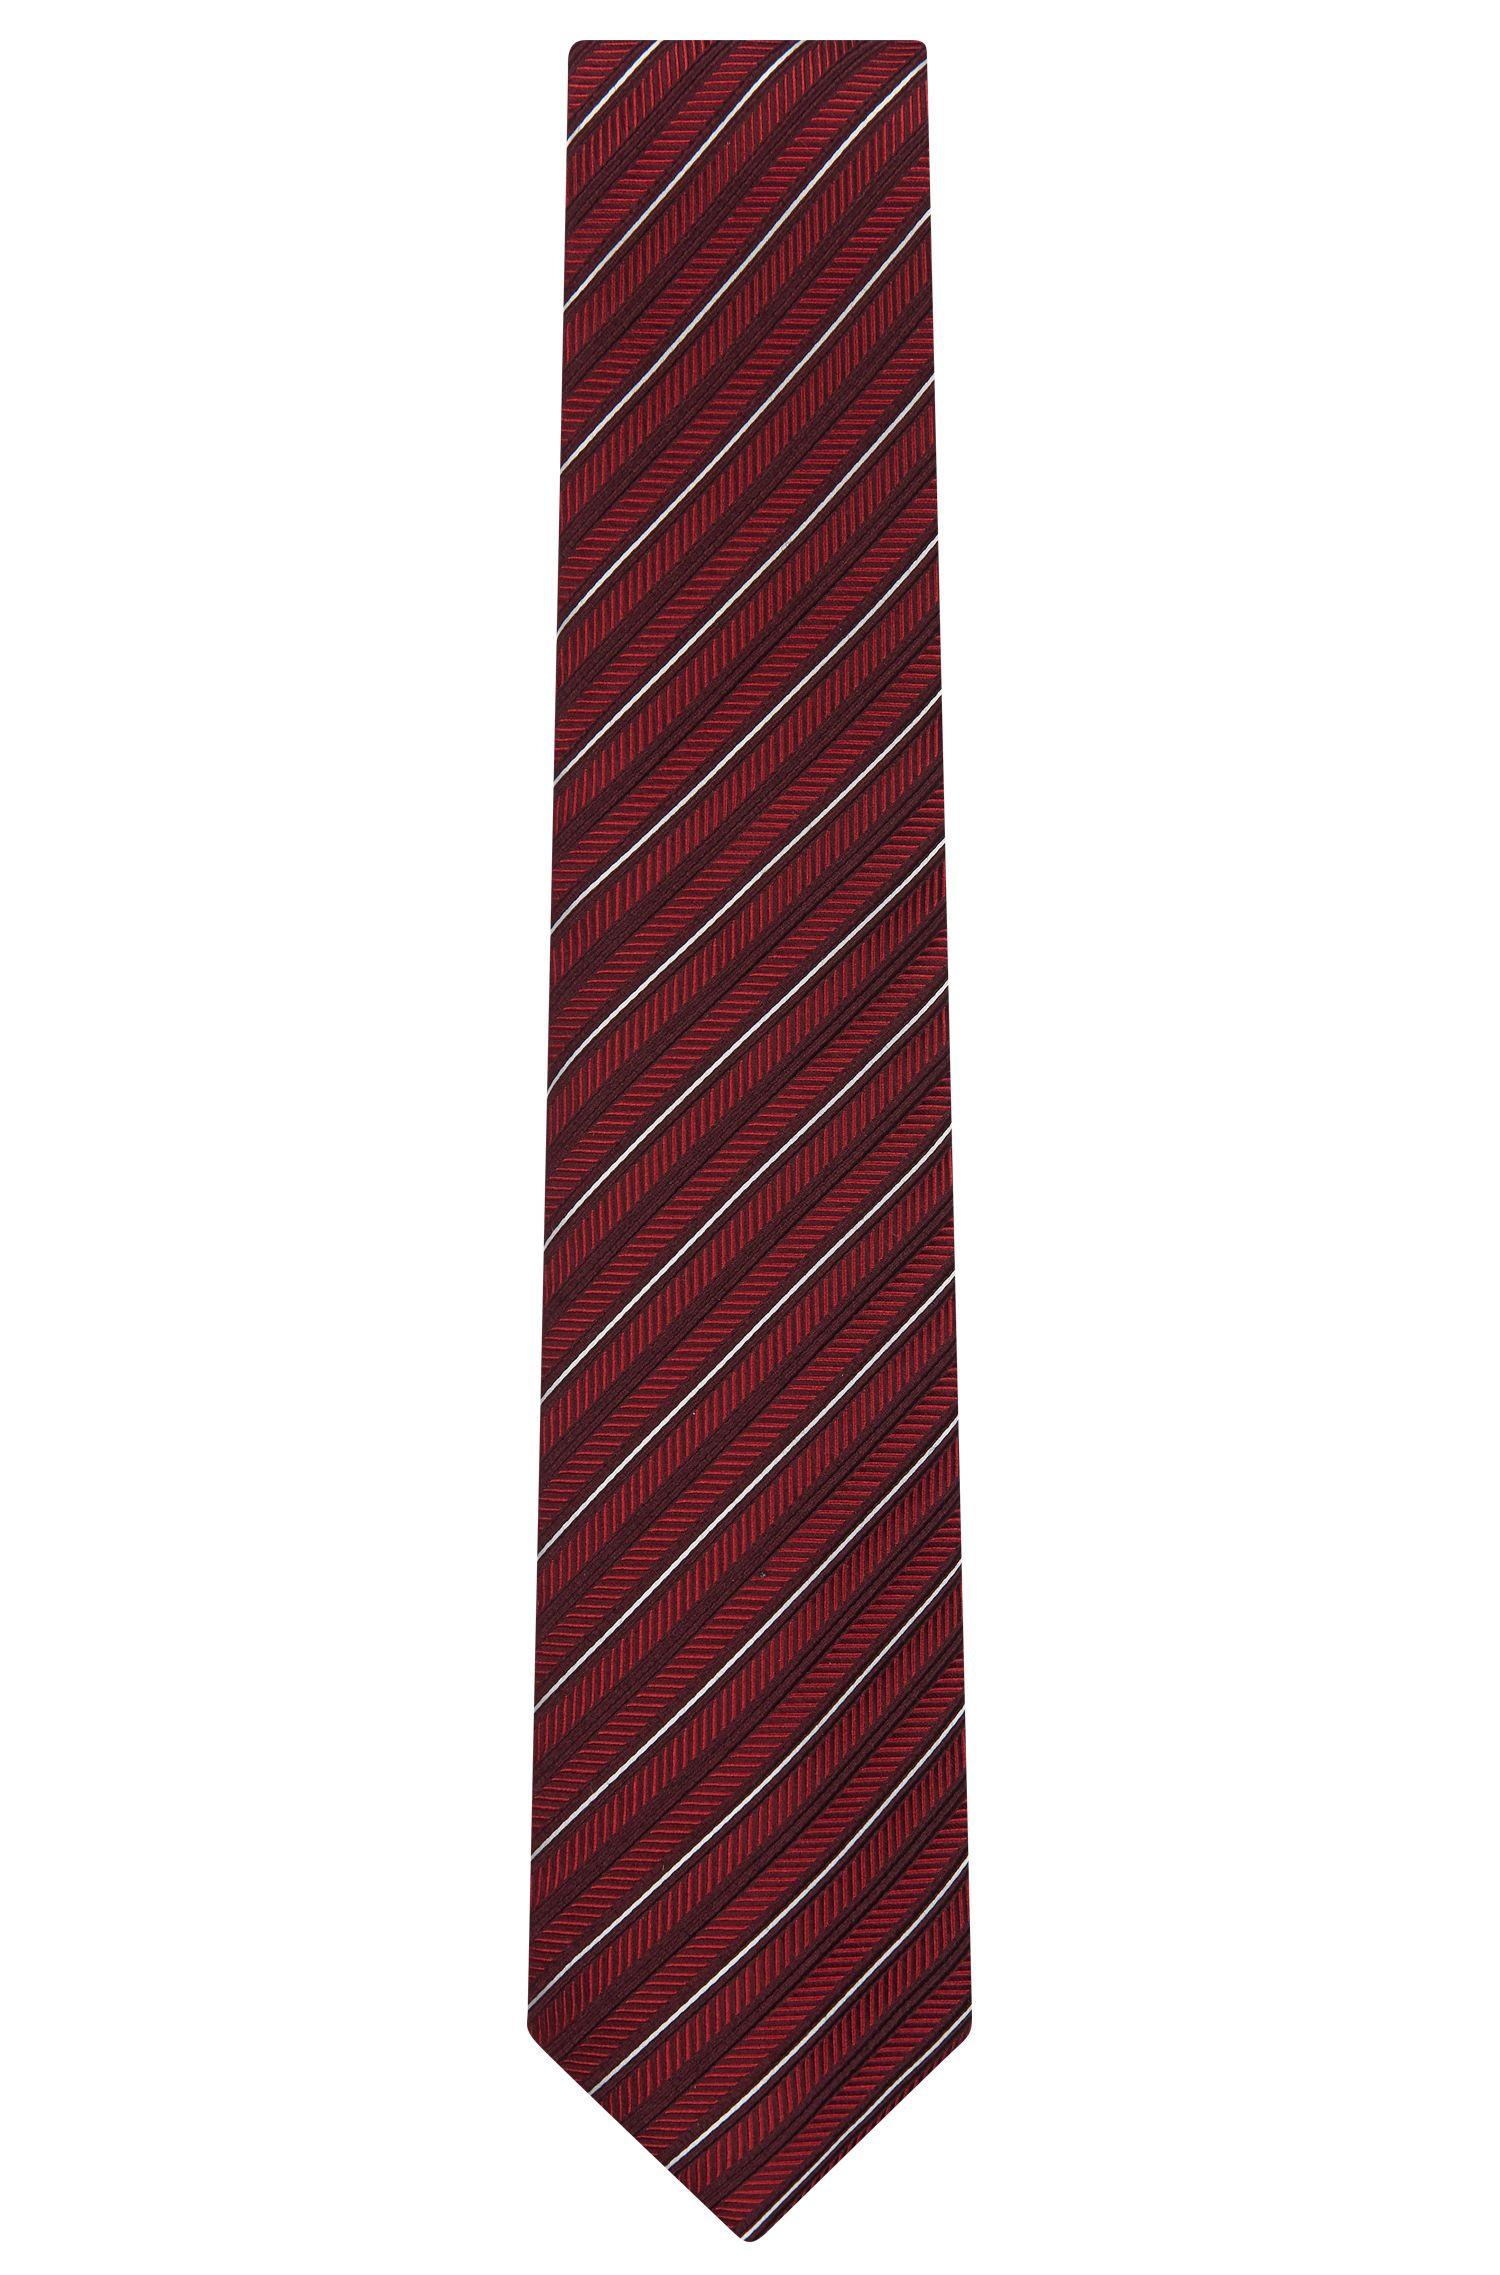 Jacquard Italian Silk Wool Tie   Tie 7.5 cm